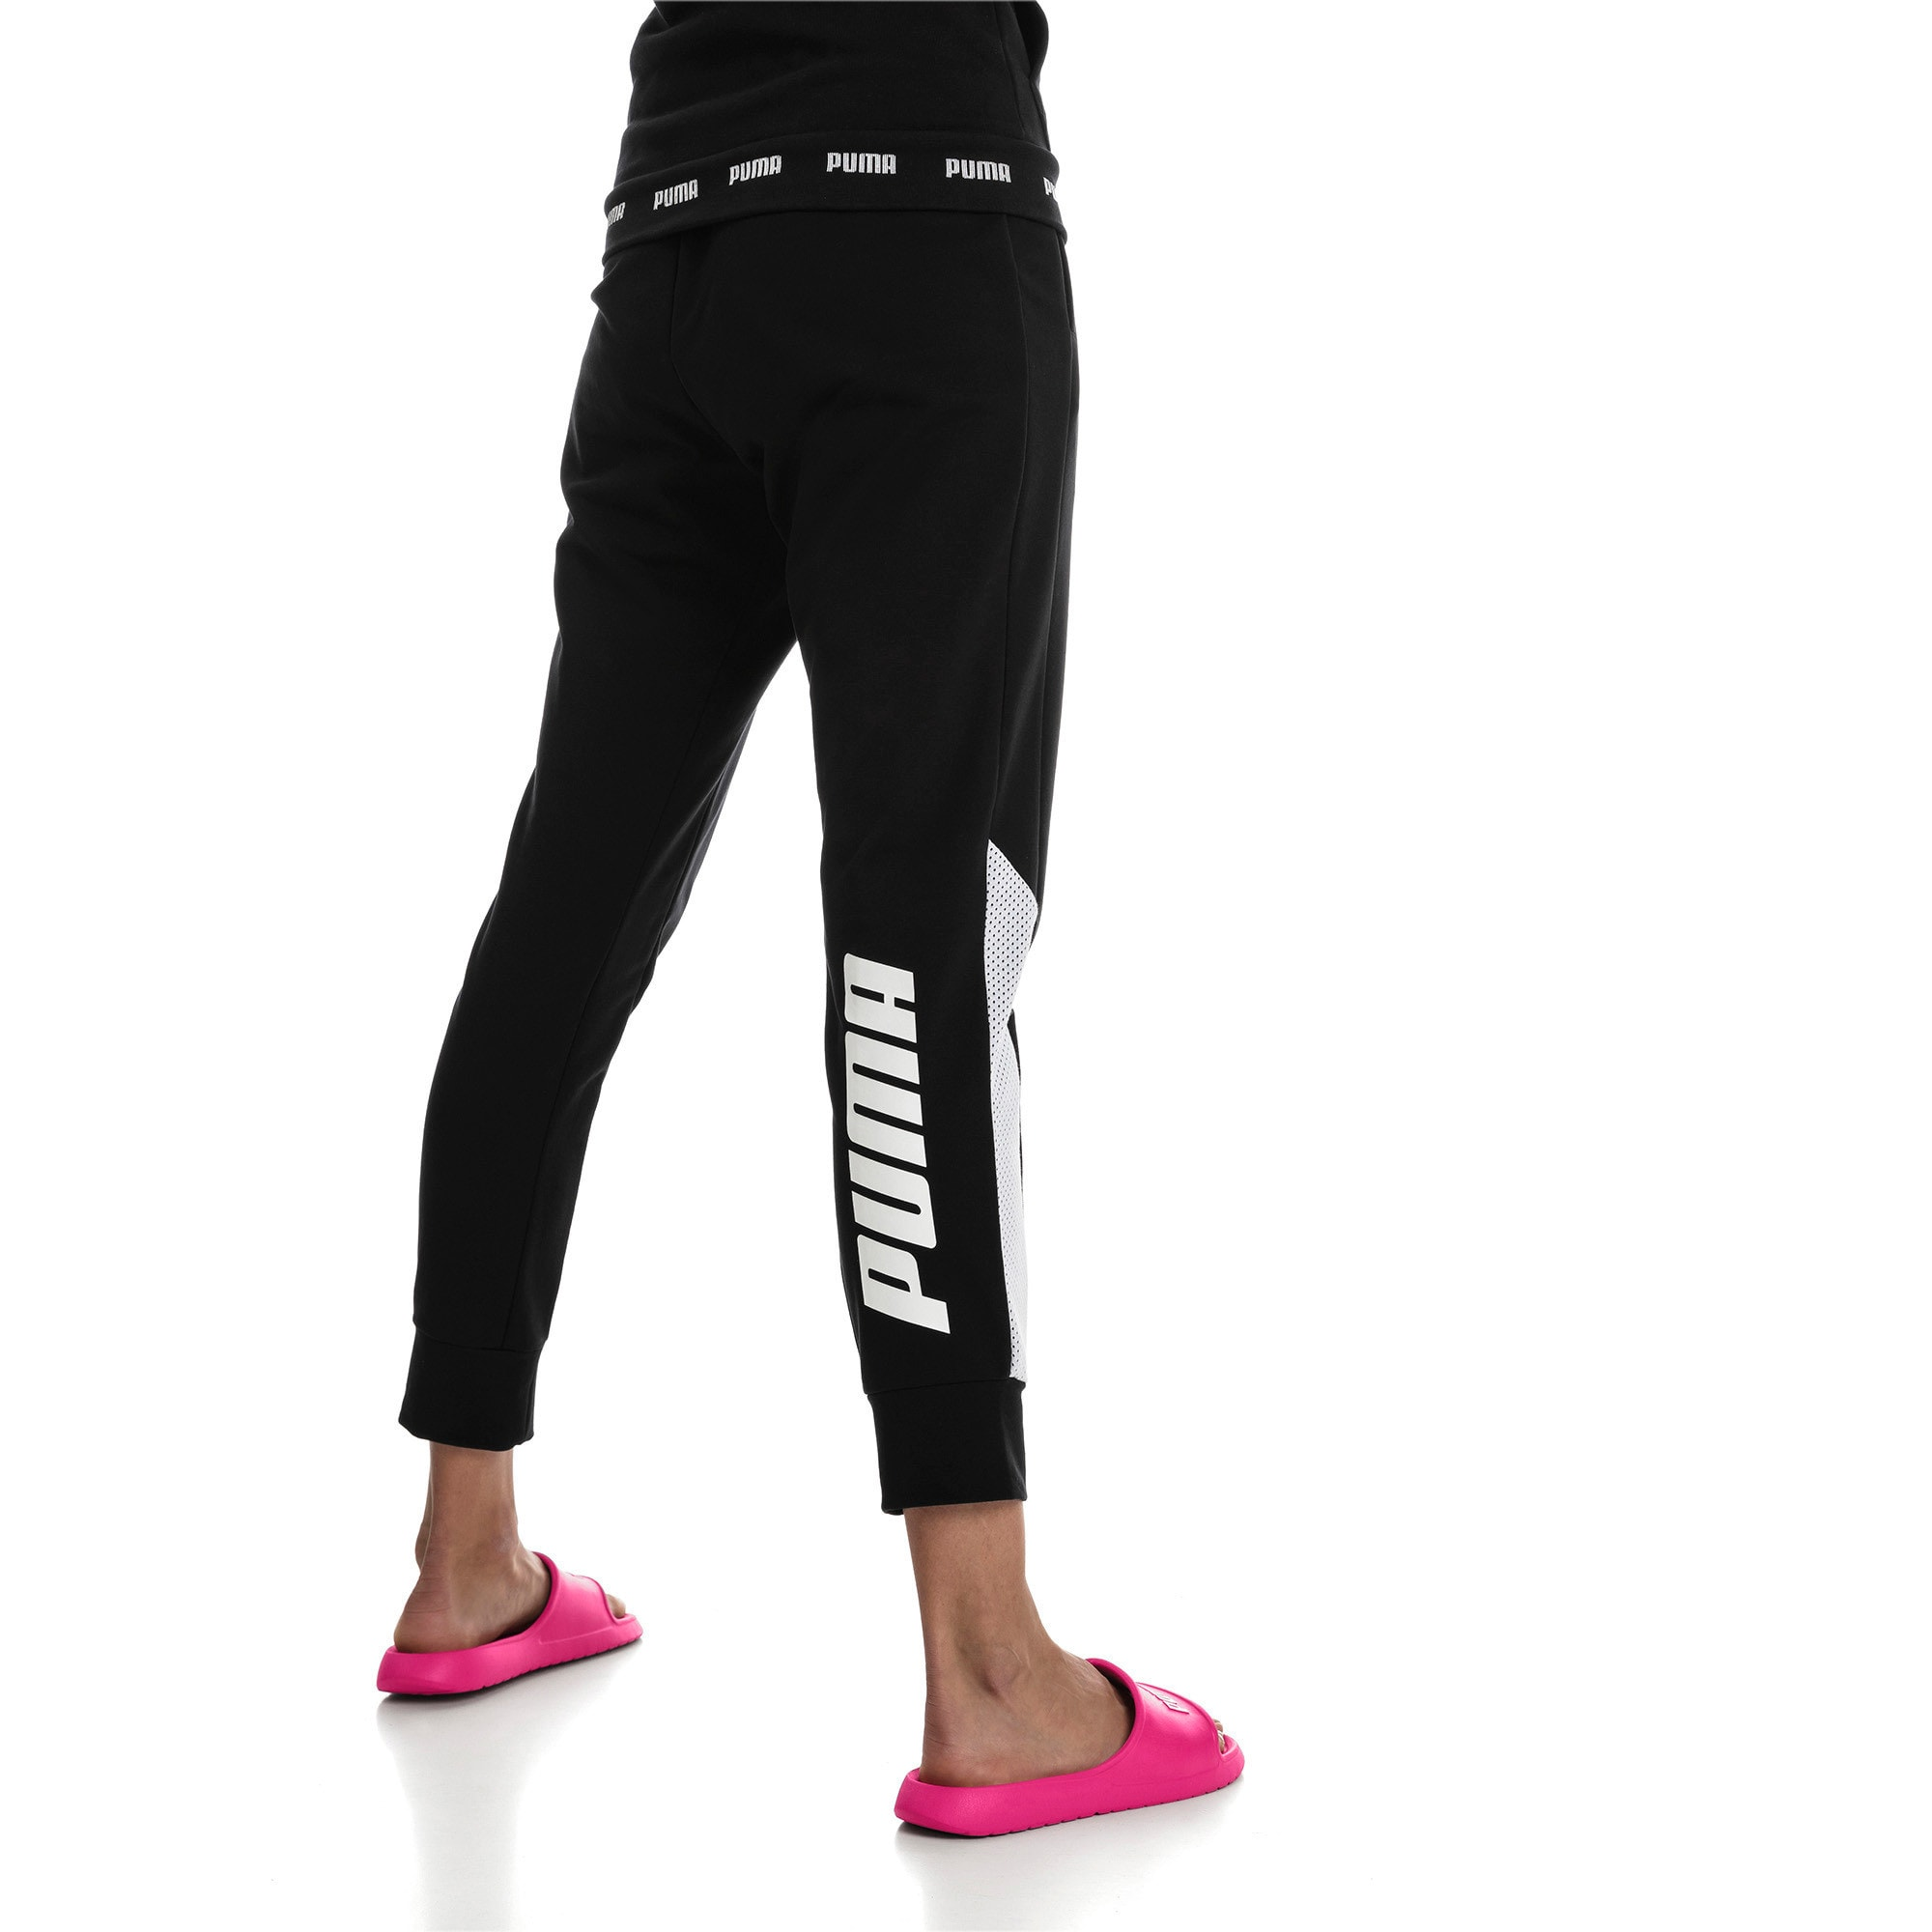 Thumbnail 2 of Modern Sports Pants, Cotton Black, medium